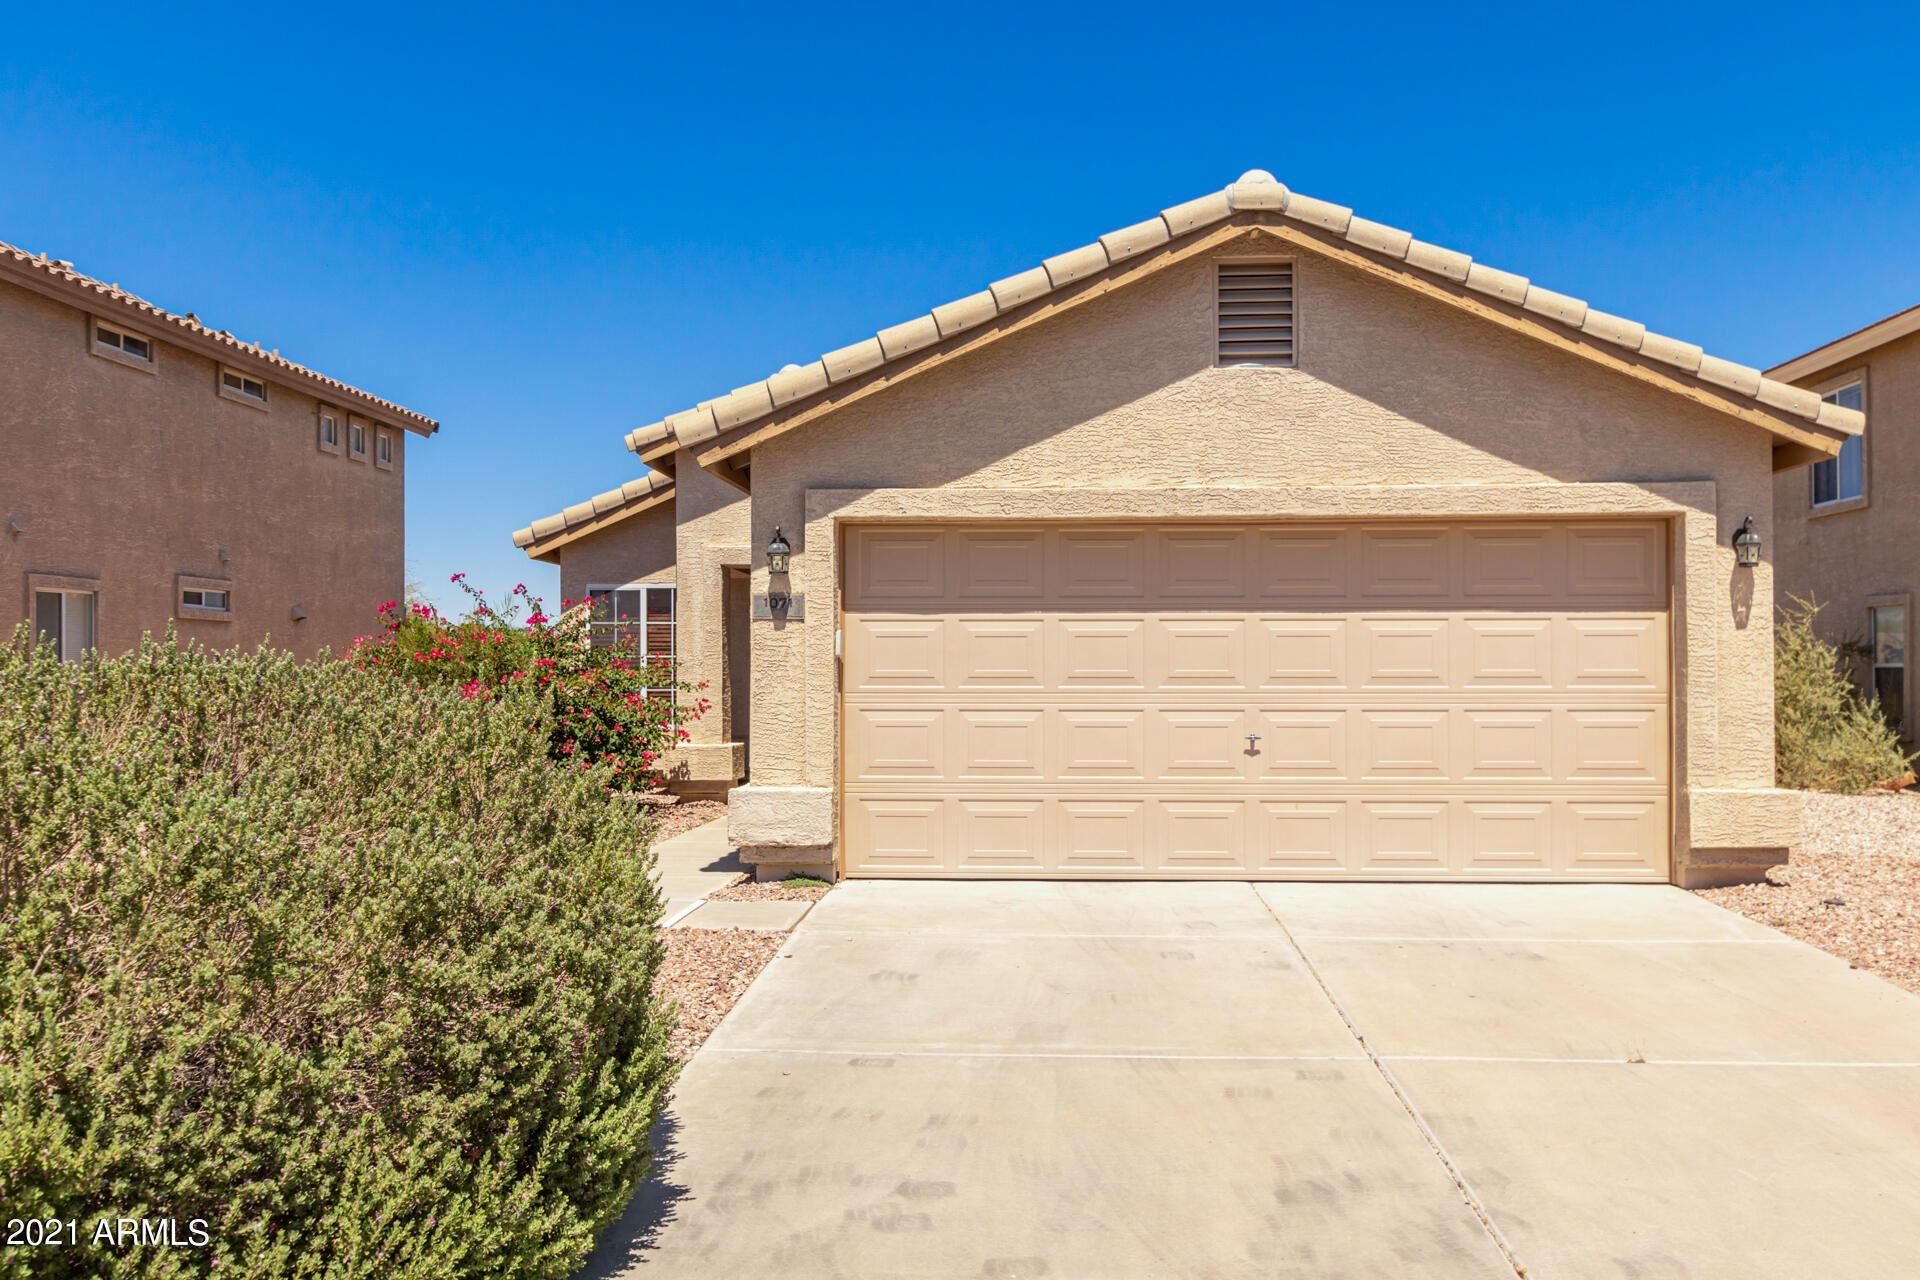 Photo of 1071 S 224TH Lane, Buckeye, AZ 85326 (MLS # 6250003)